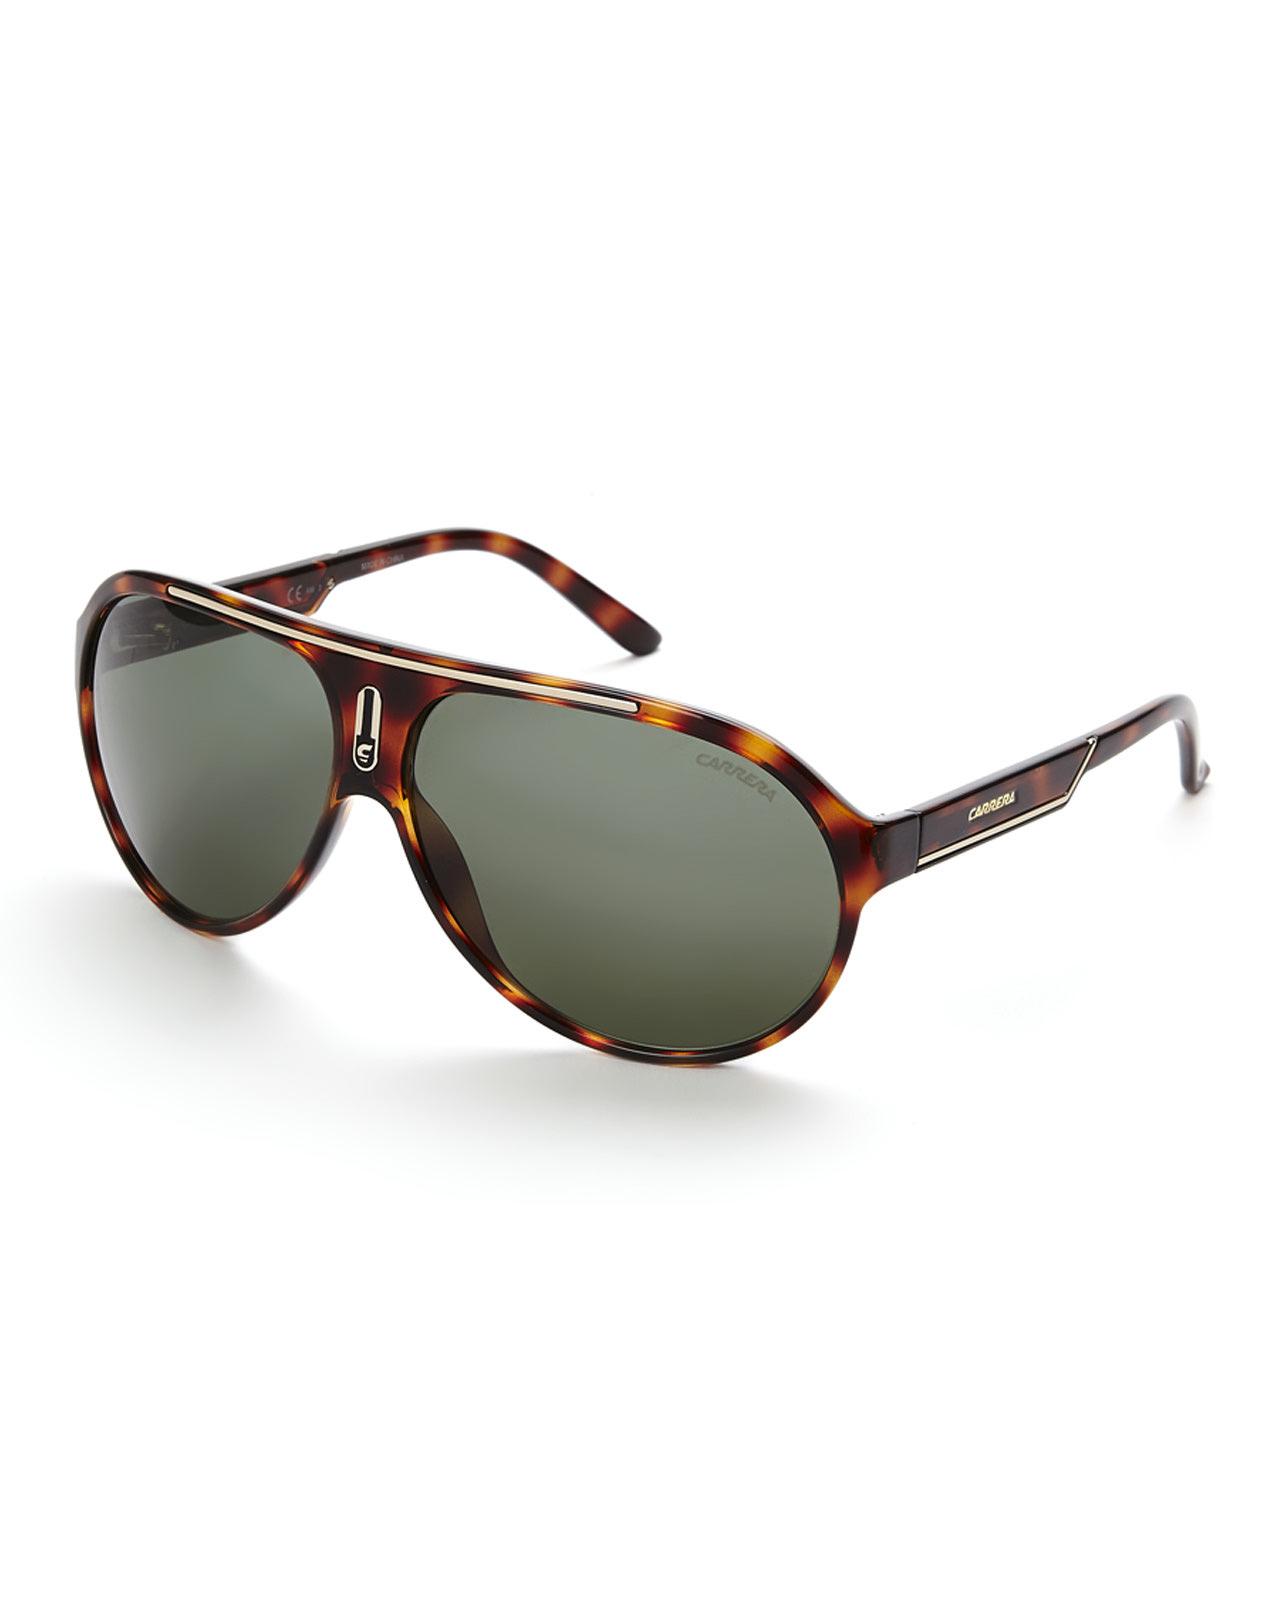 Sunglasses Carrera Aviator Louisiana Bucket Brigade